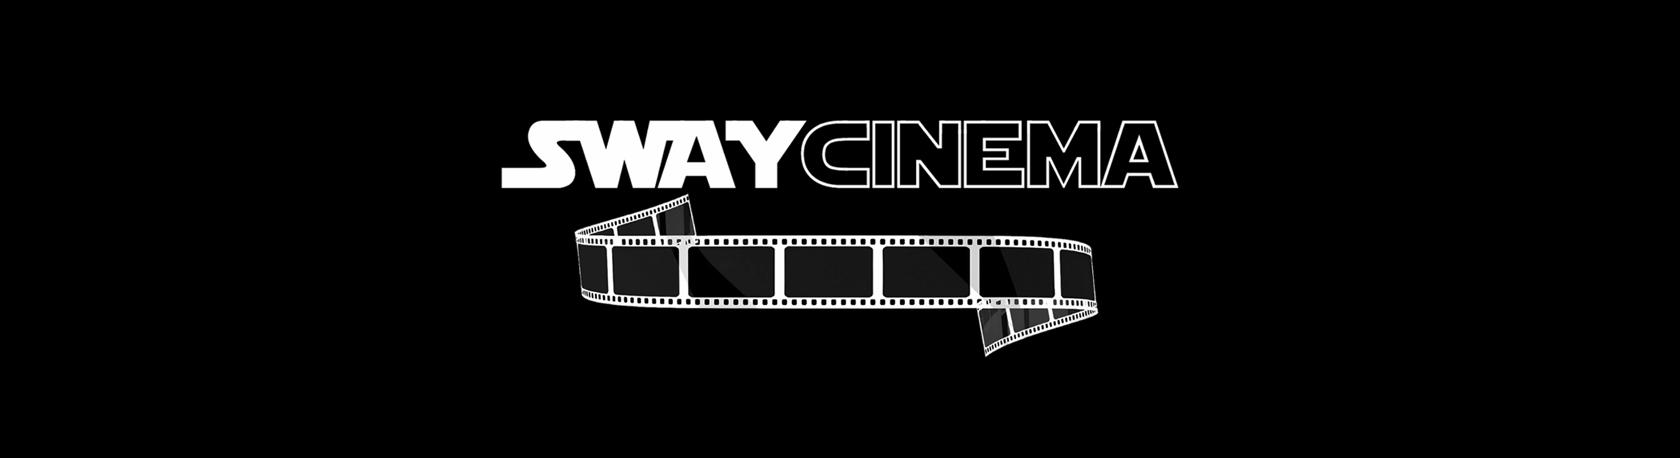 Sway Cinema